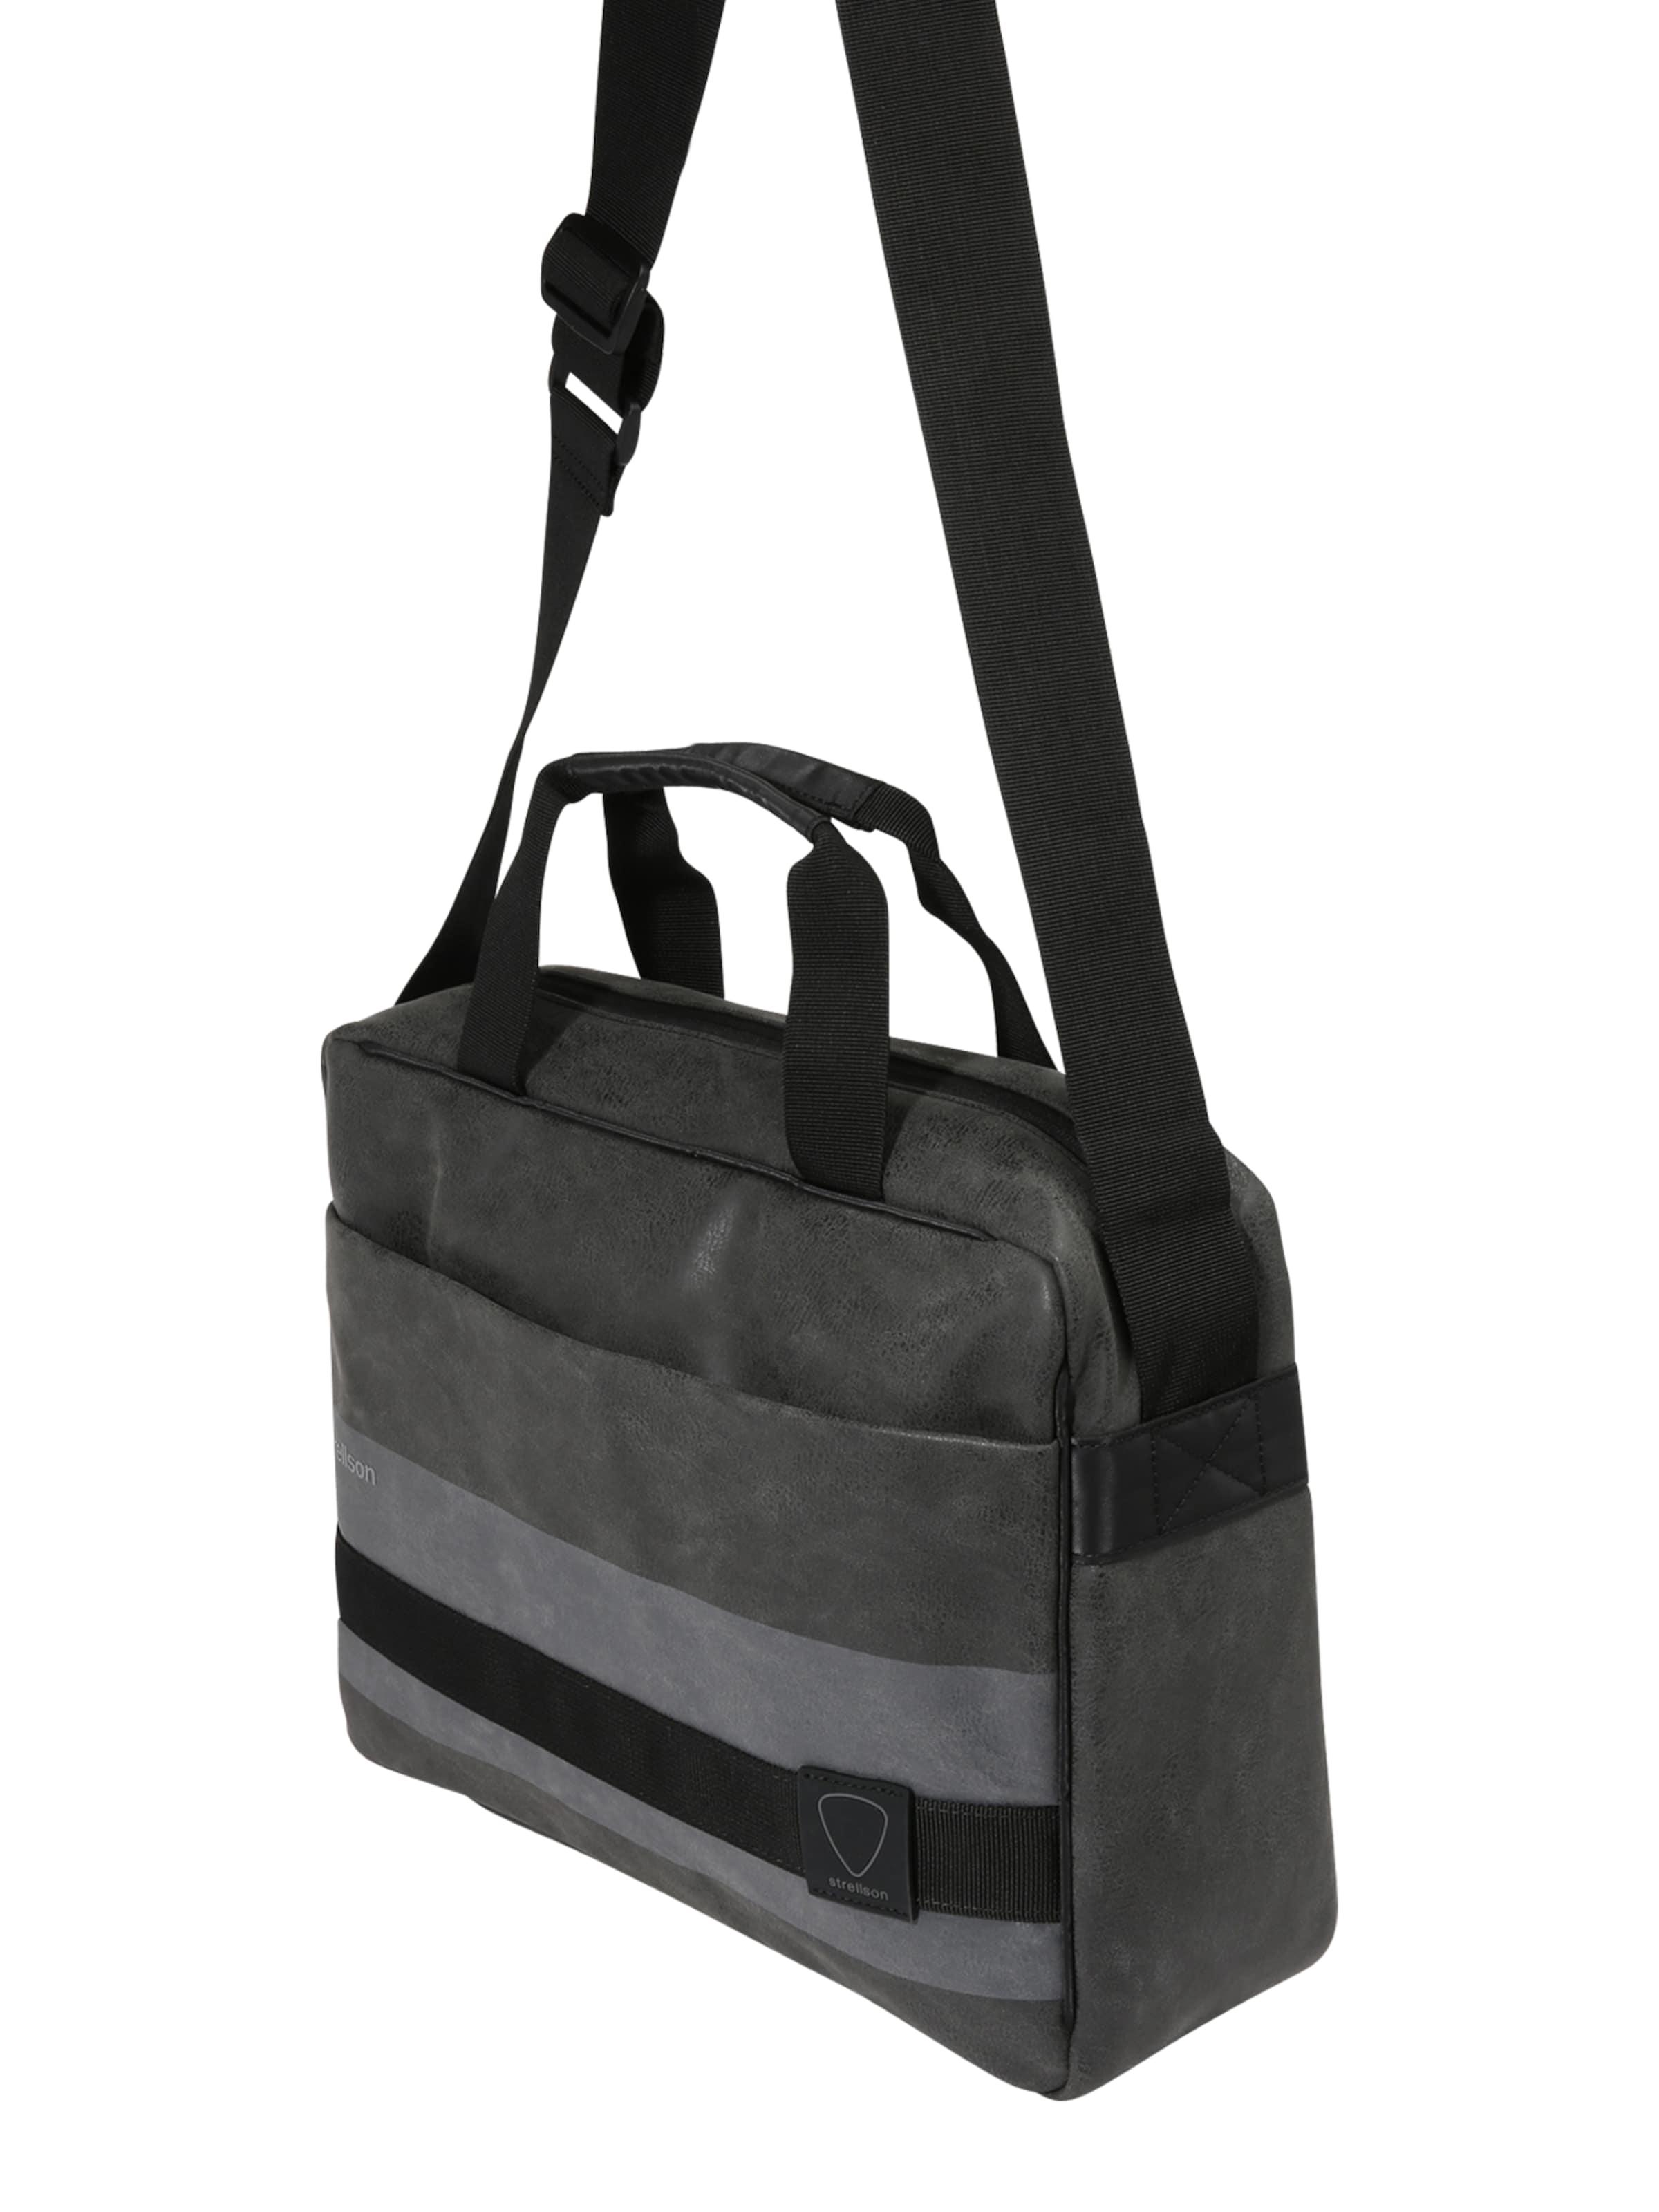 'mhz In Finchley' Dunkelgrau Taschen Strellson 35JucTFlK1